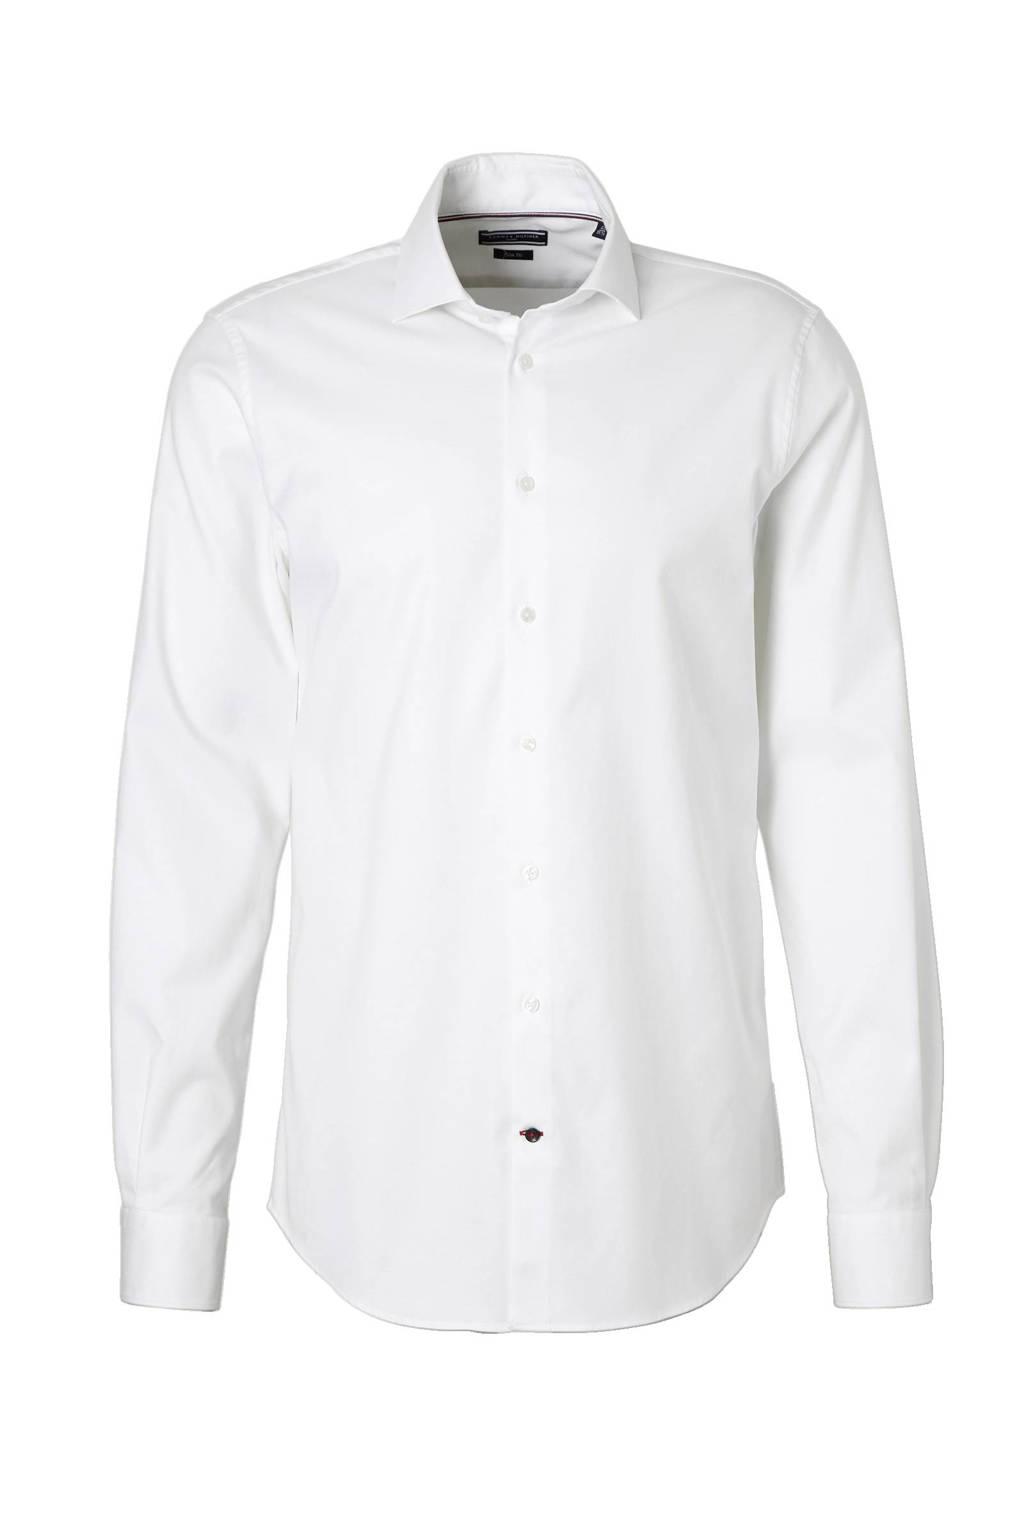 Tommy Hilfiger Tailored slim fit overhemd, Wit